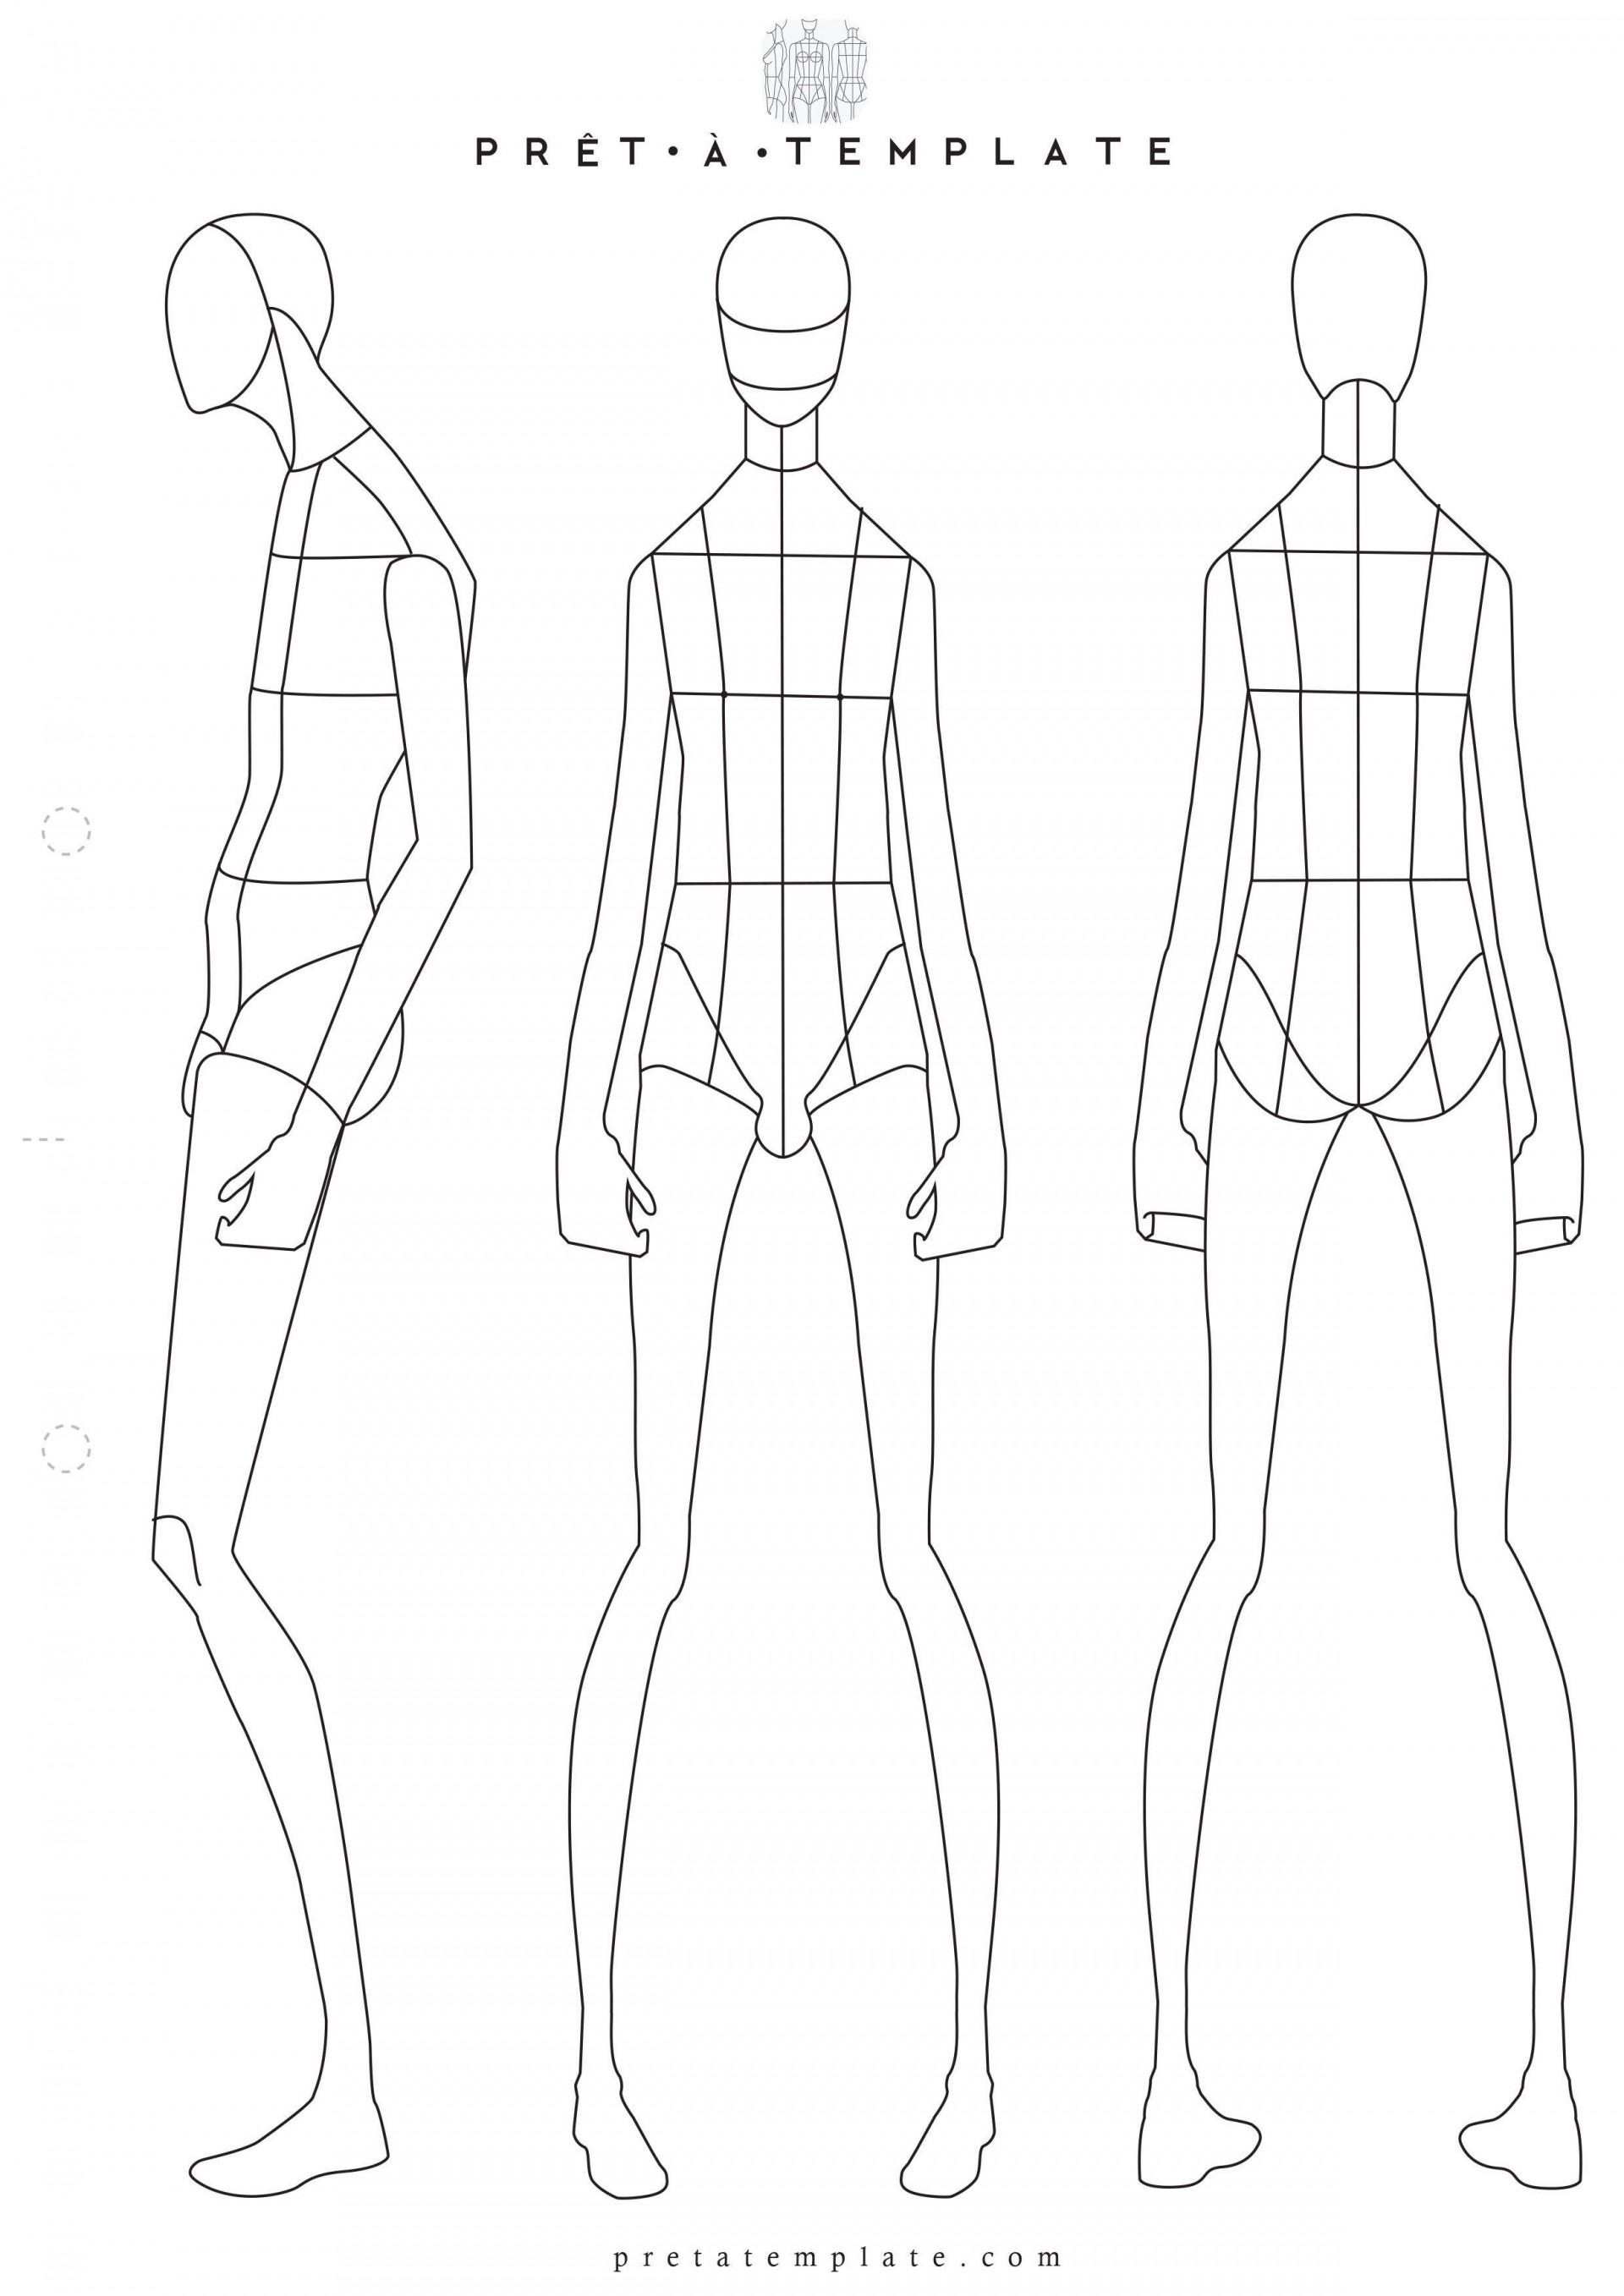 001 Sensational Body Template For Fashion Design High Definition  Female Male Human1920